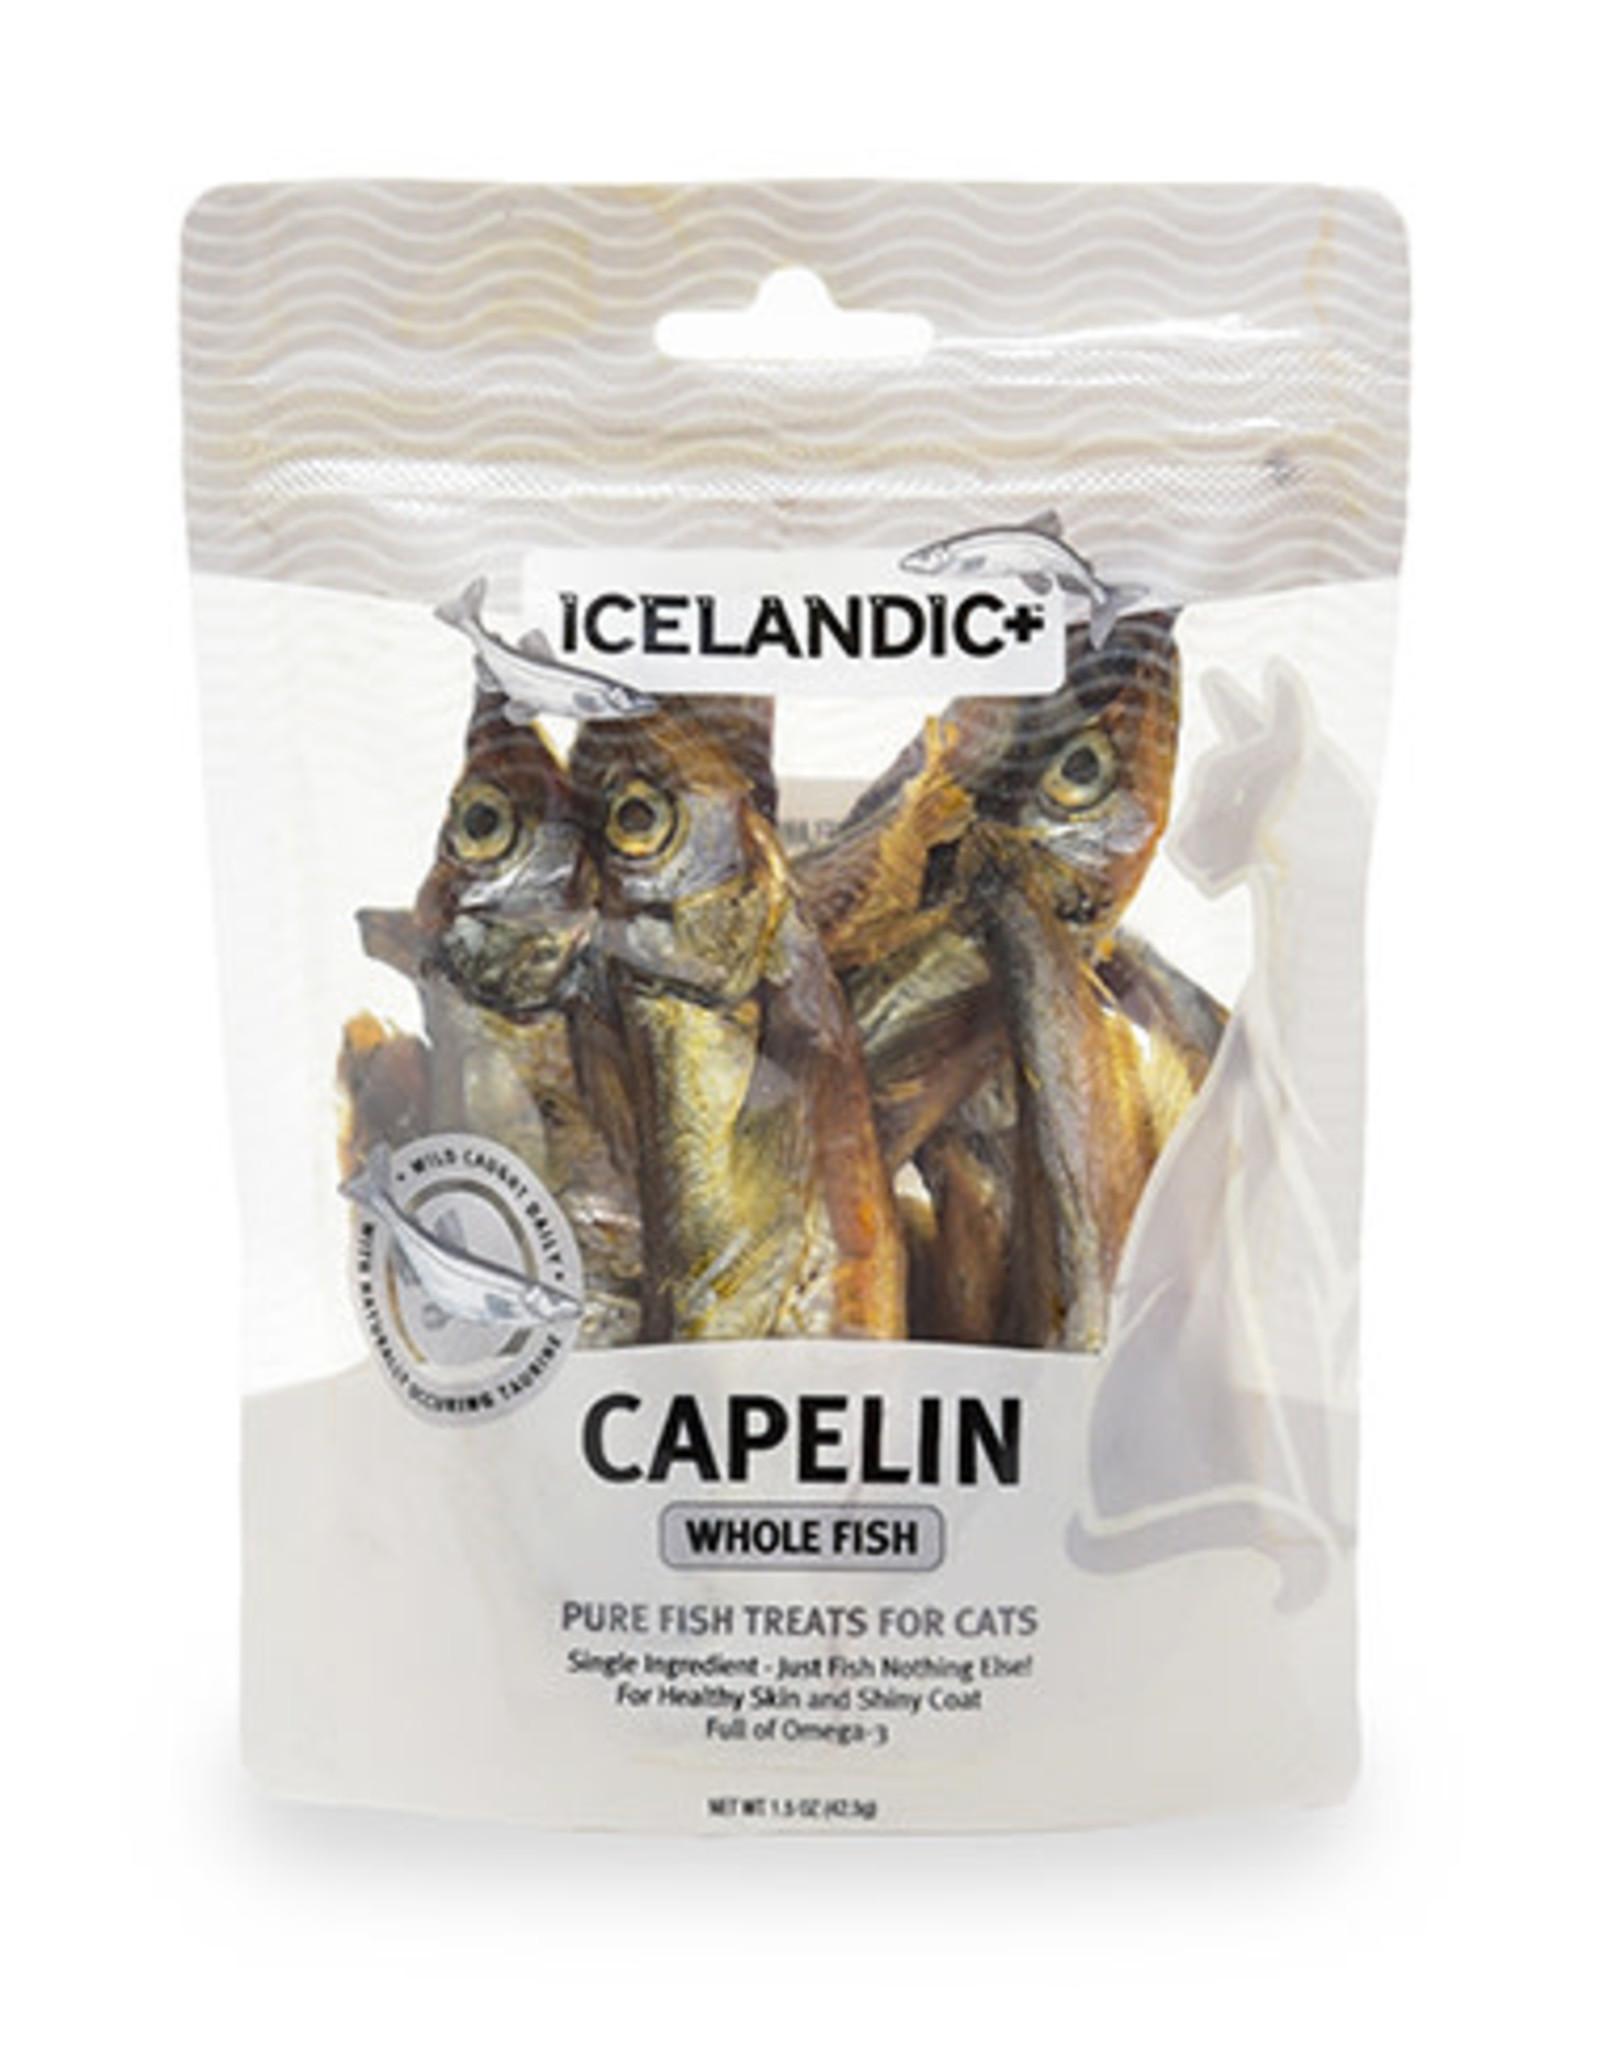 Icelandic+ ICELANDIC CAT CAPELIN WHOLE FISH TREAT 1.5OZ